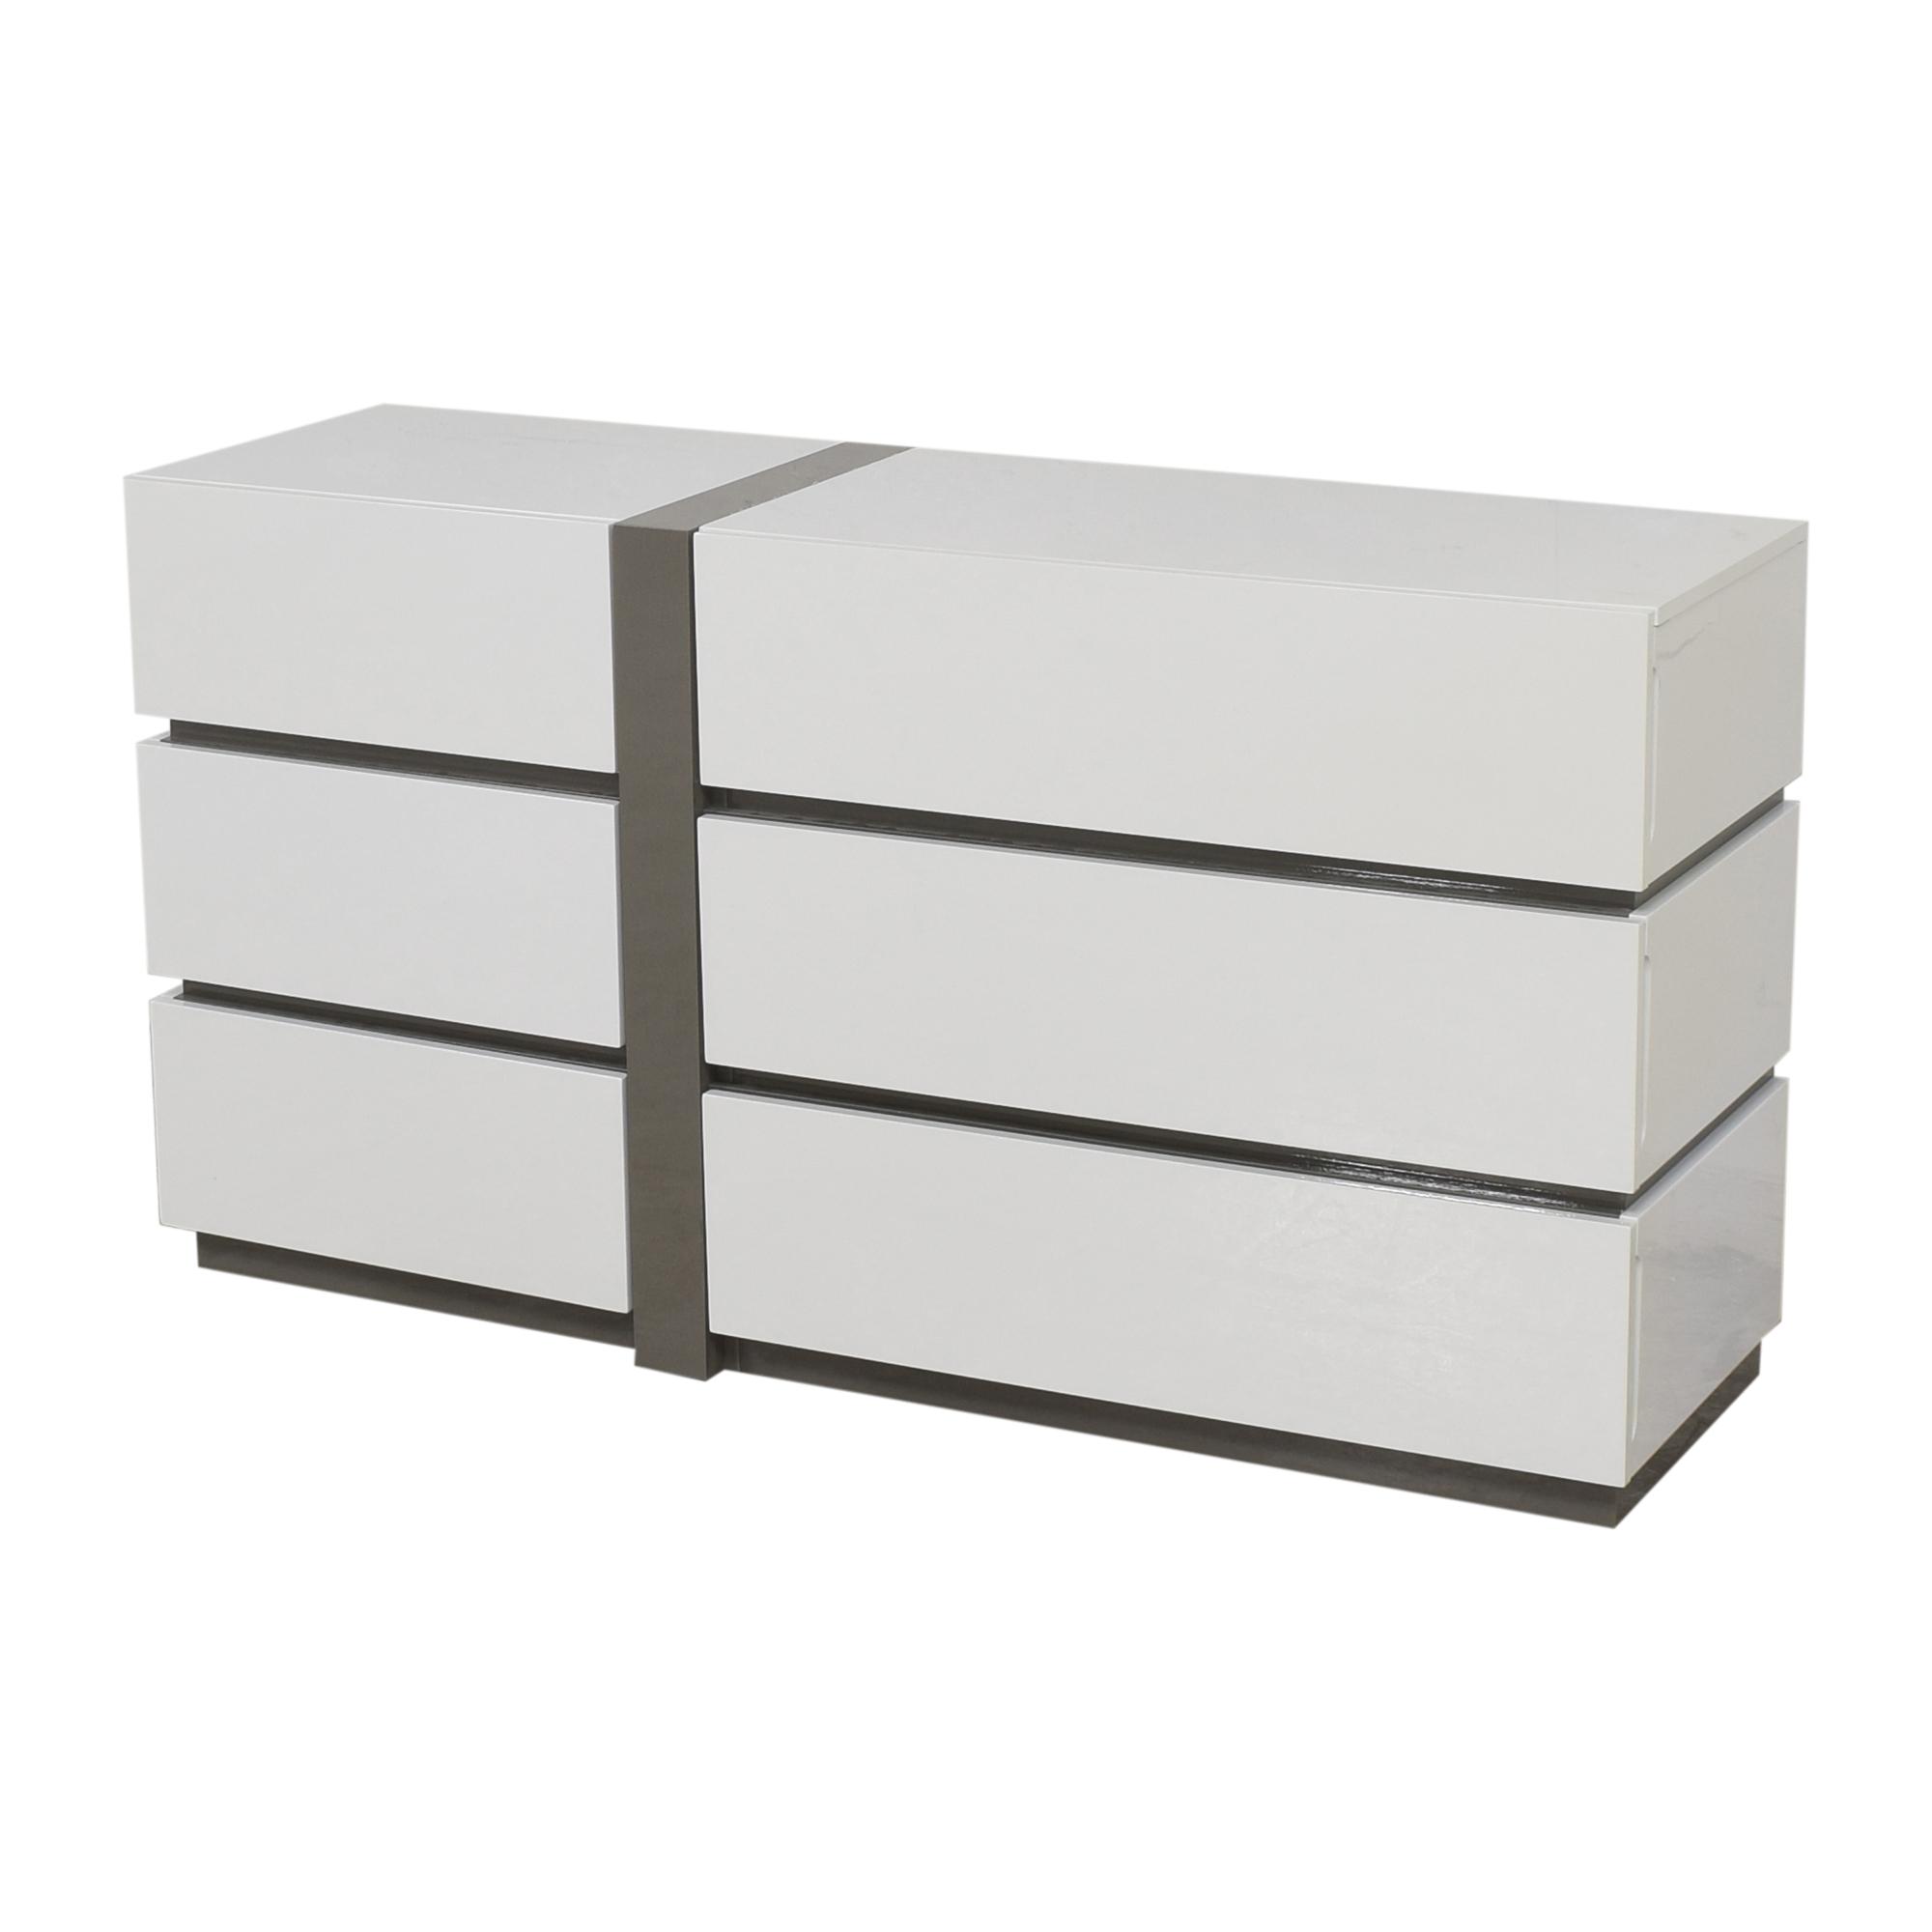 Chintaly Imports Chintaly Imports Manila Six Drawer Dresser ct